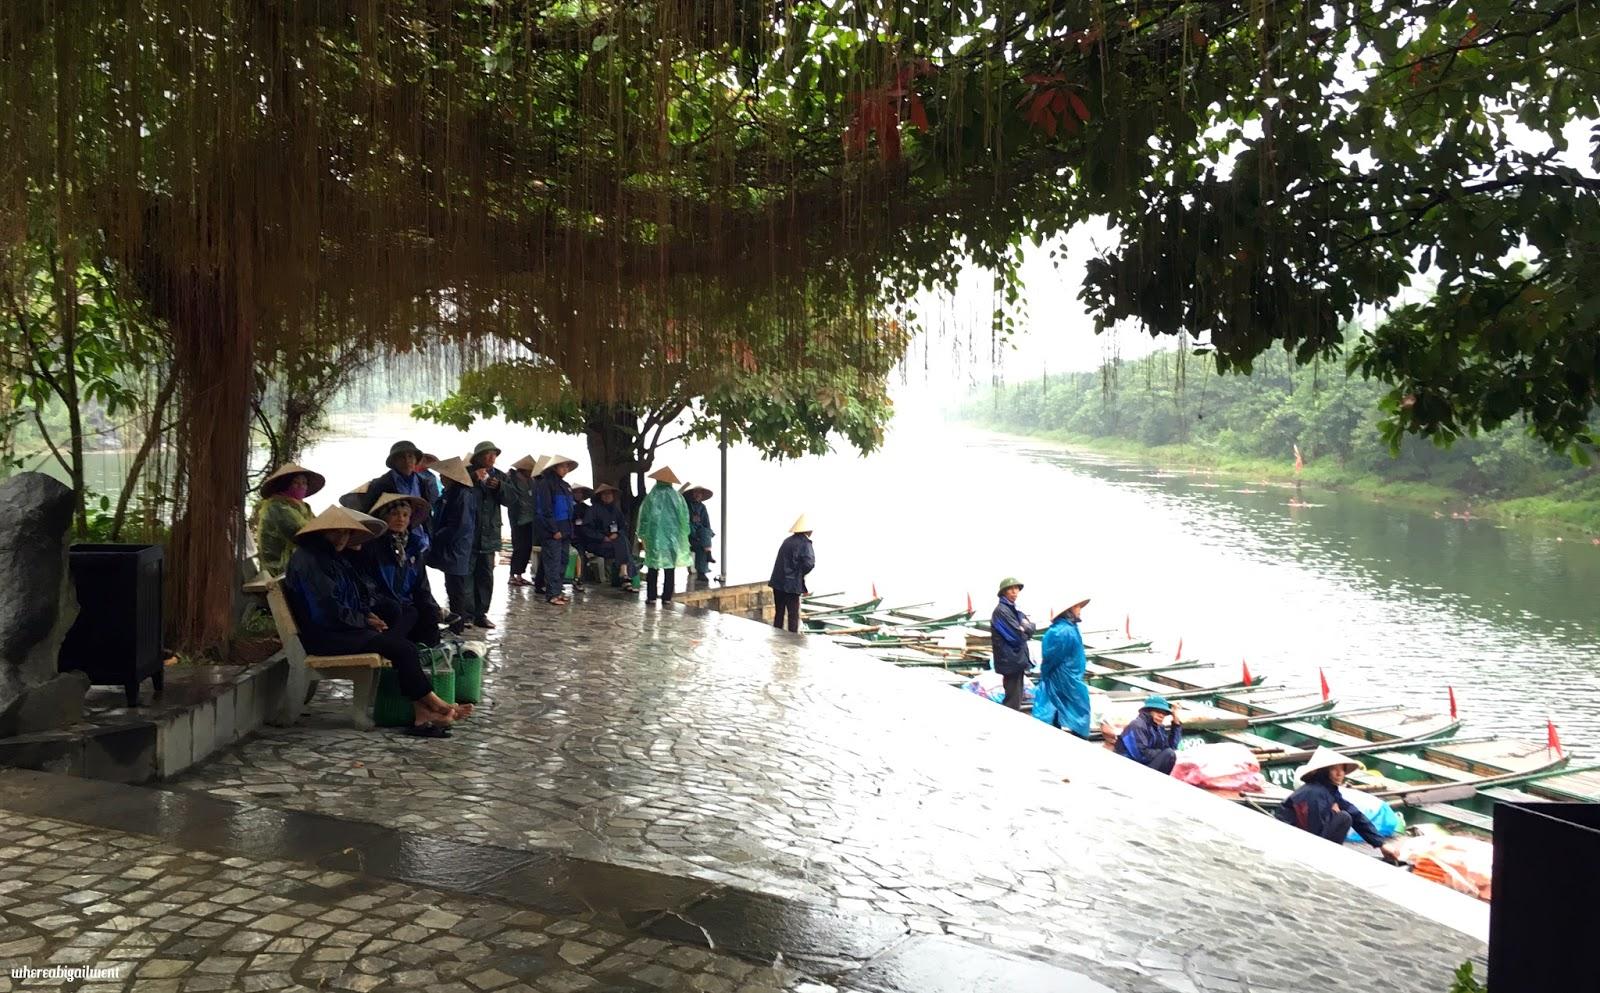 Hanoi Day Tour (Ninh Binh, Vietnam)